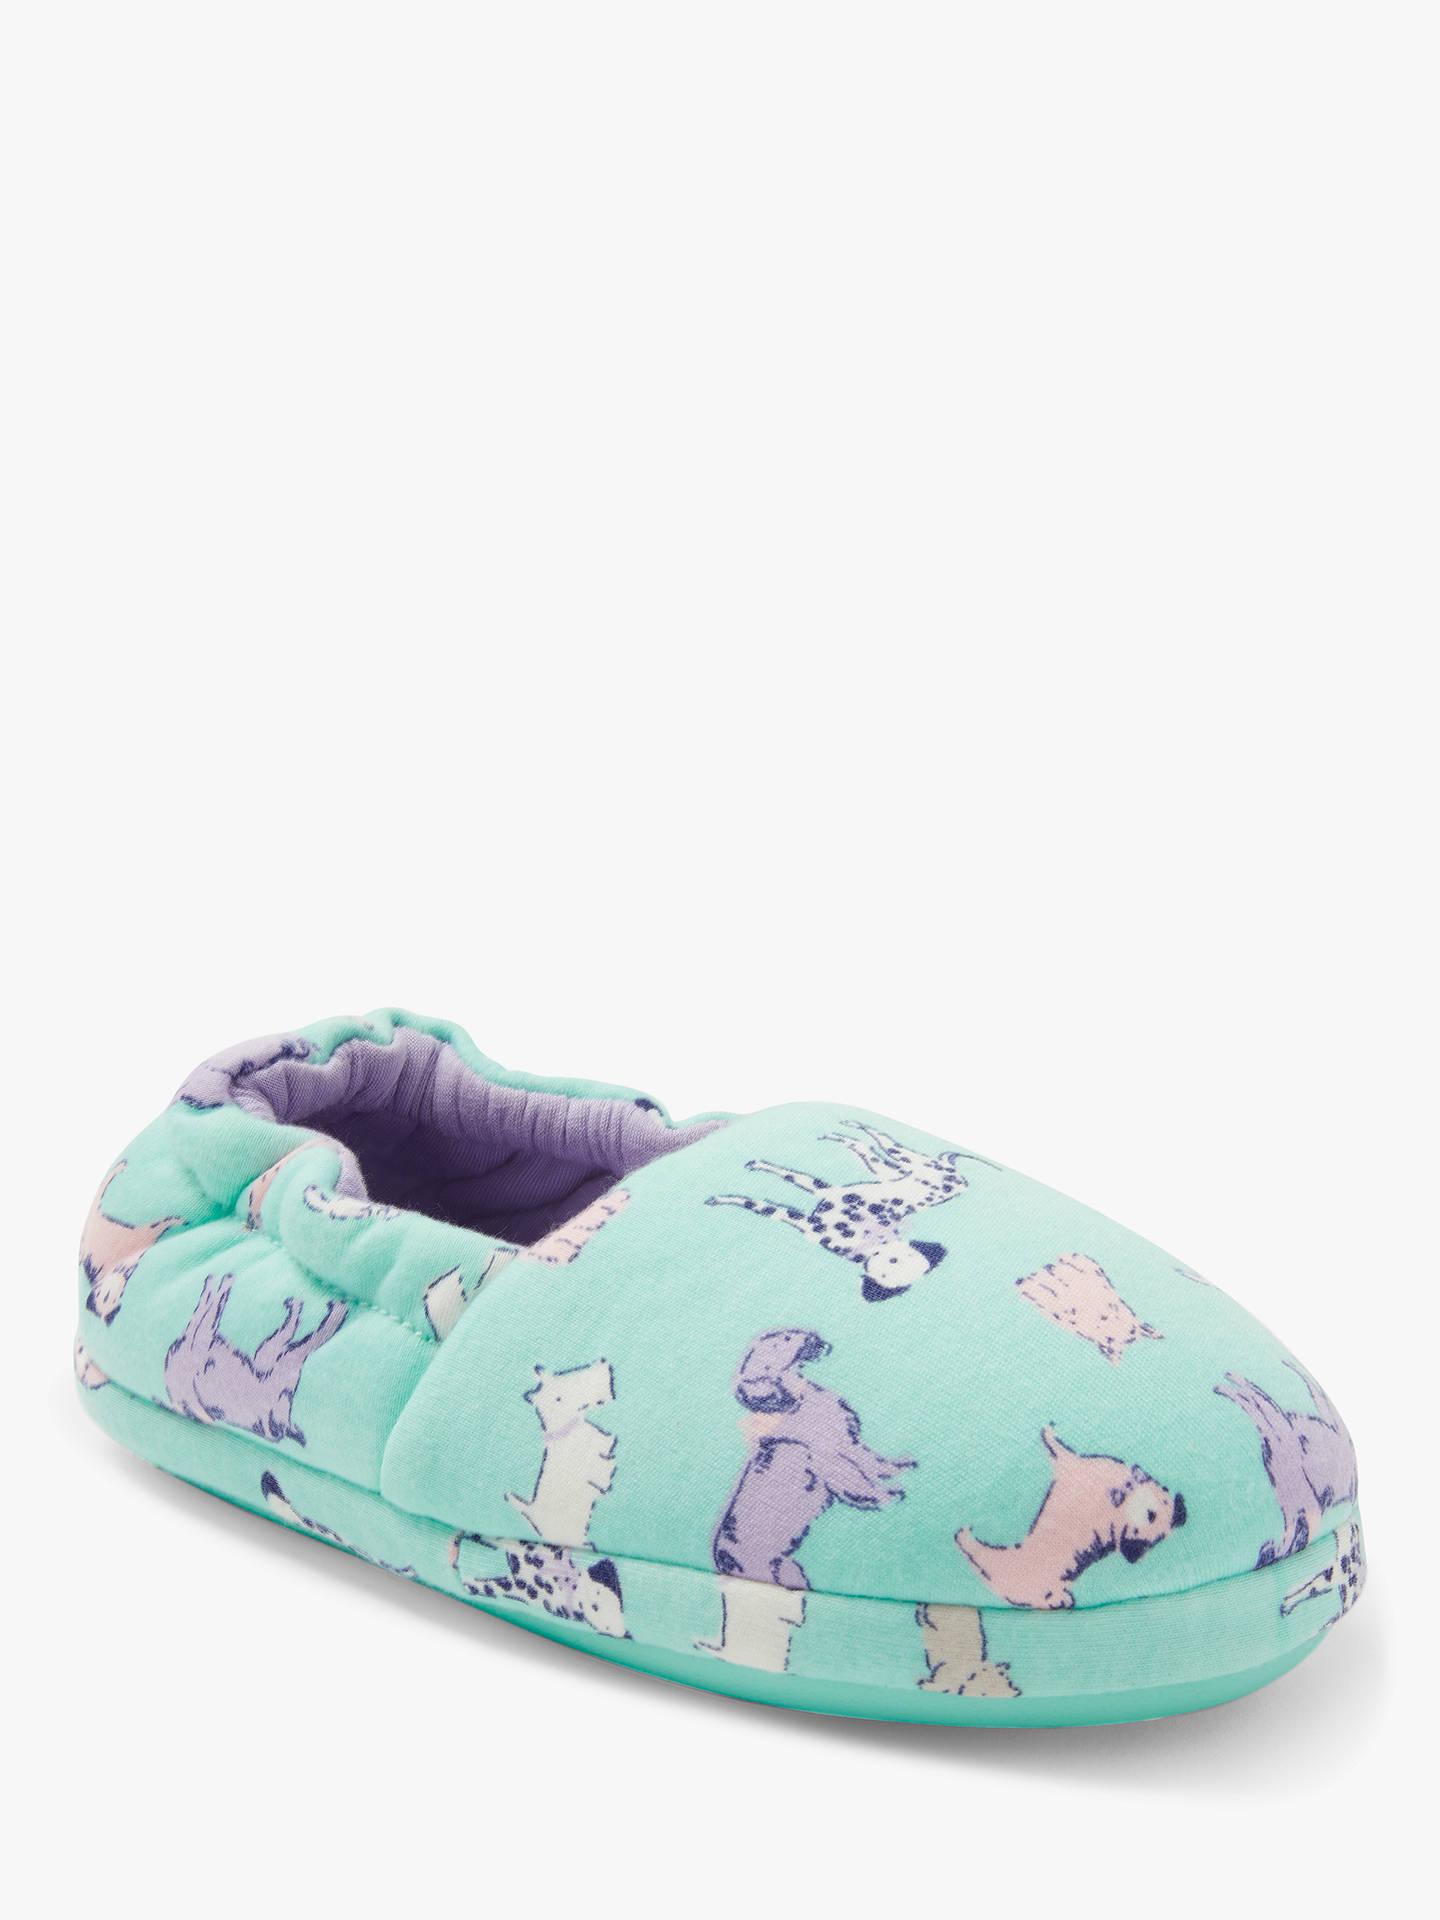 3fa9fdcecf9 Buy John Lewis   Partners Children s Dog Slippers